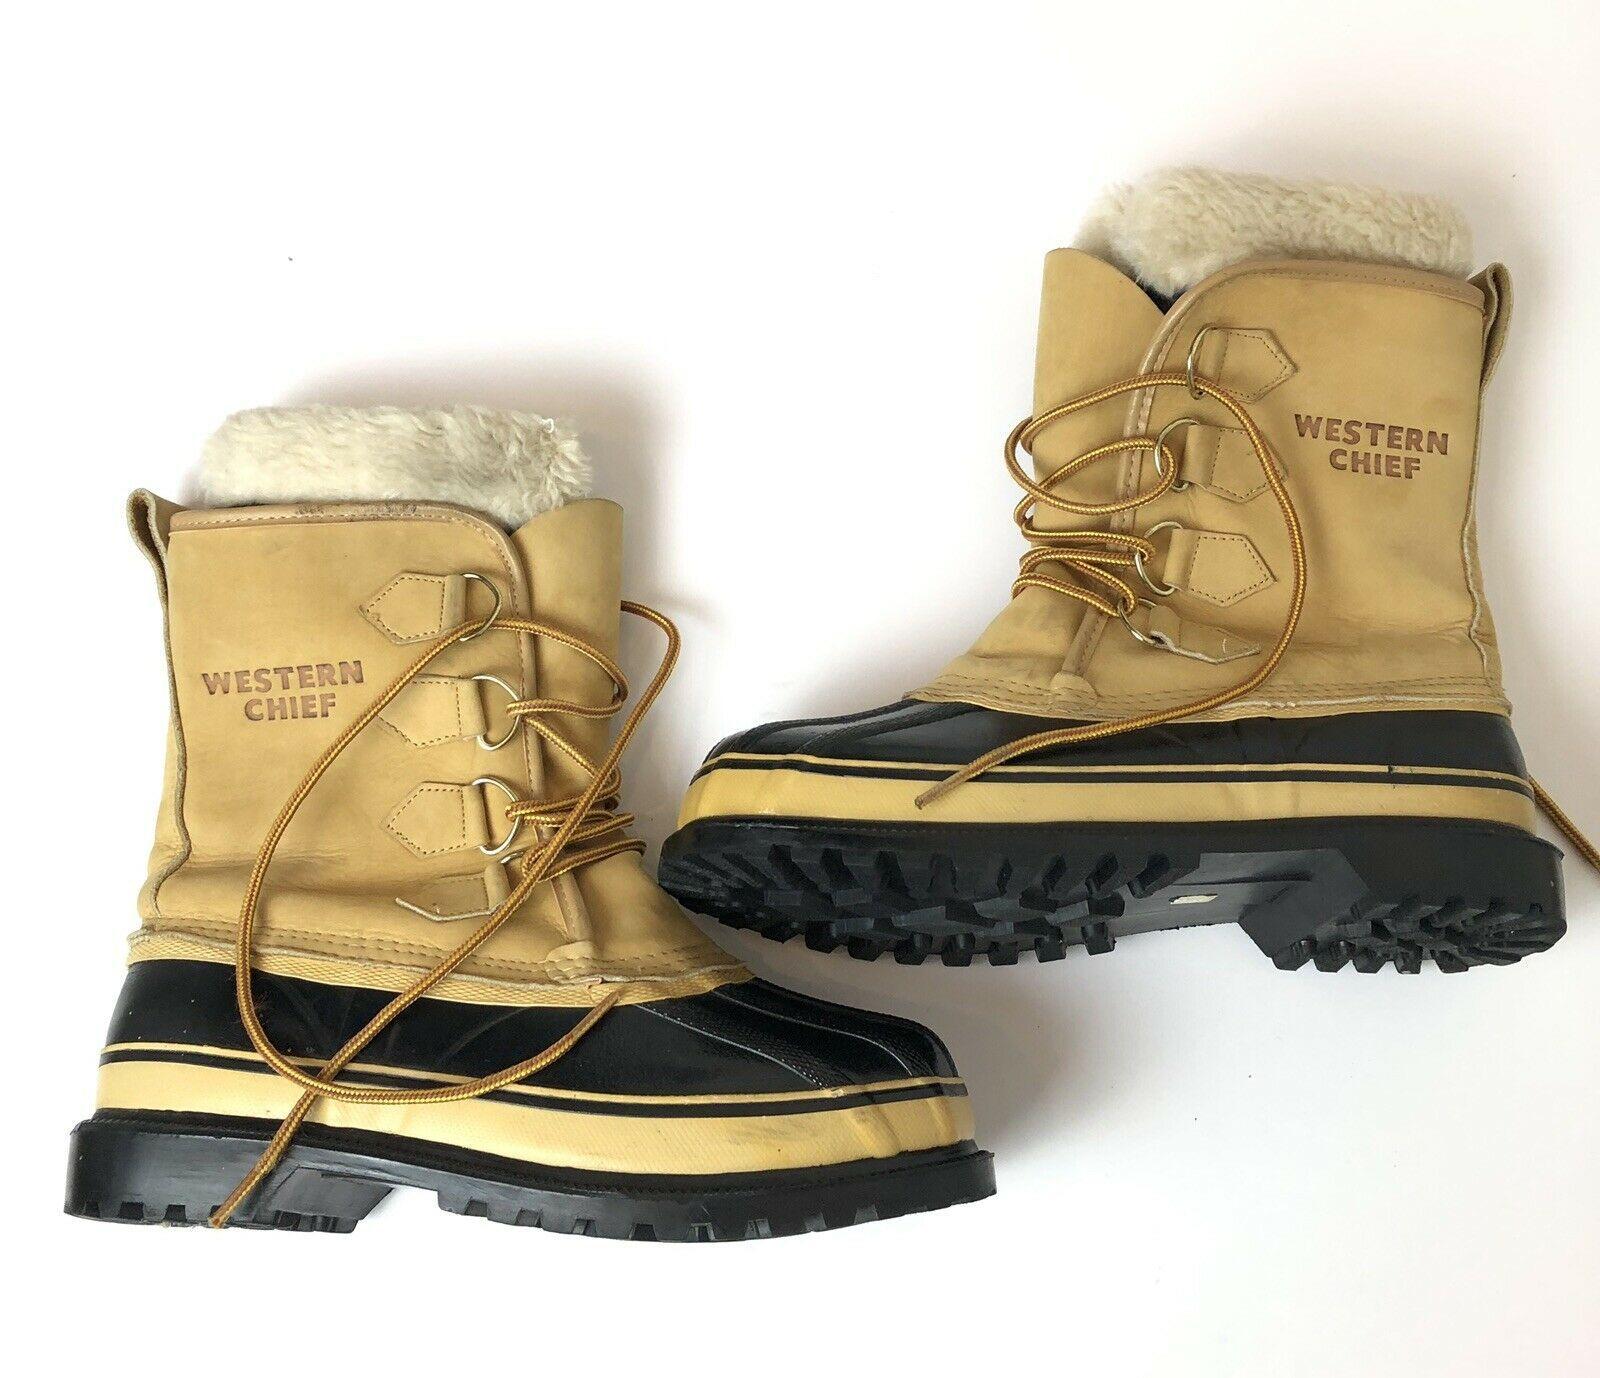 6feeaef19 Western Chief Duck Boots Mens Size 9 Thermolite Leather Weatherproof Steel  Shank | eBay